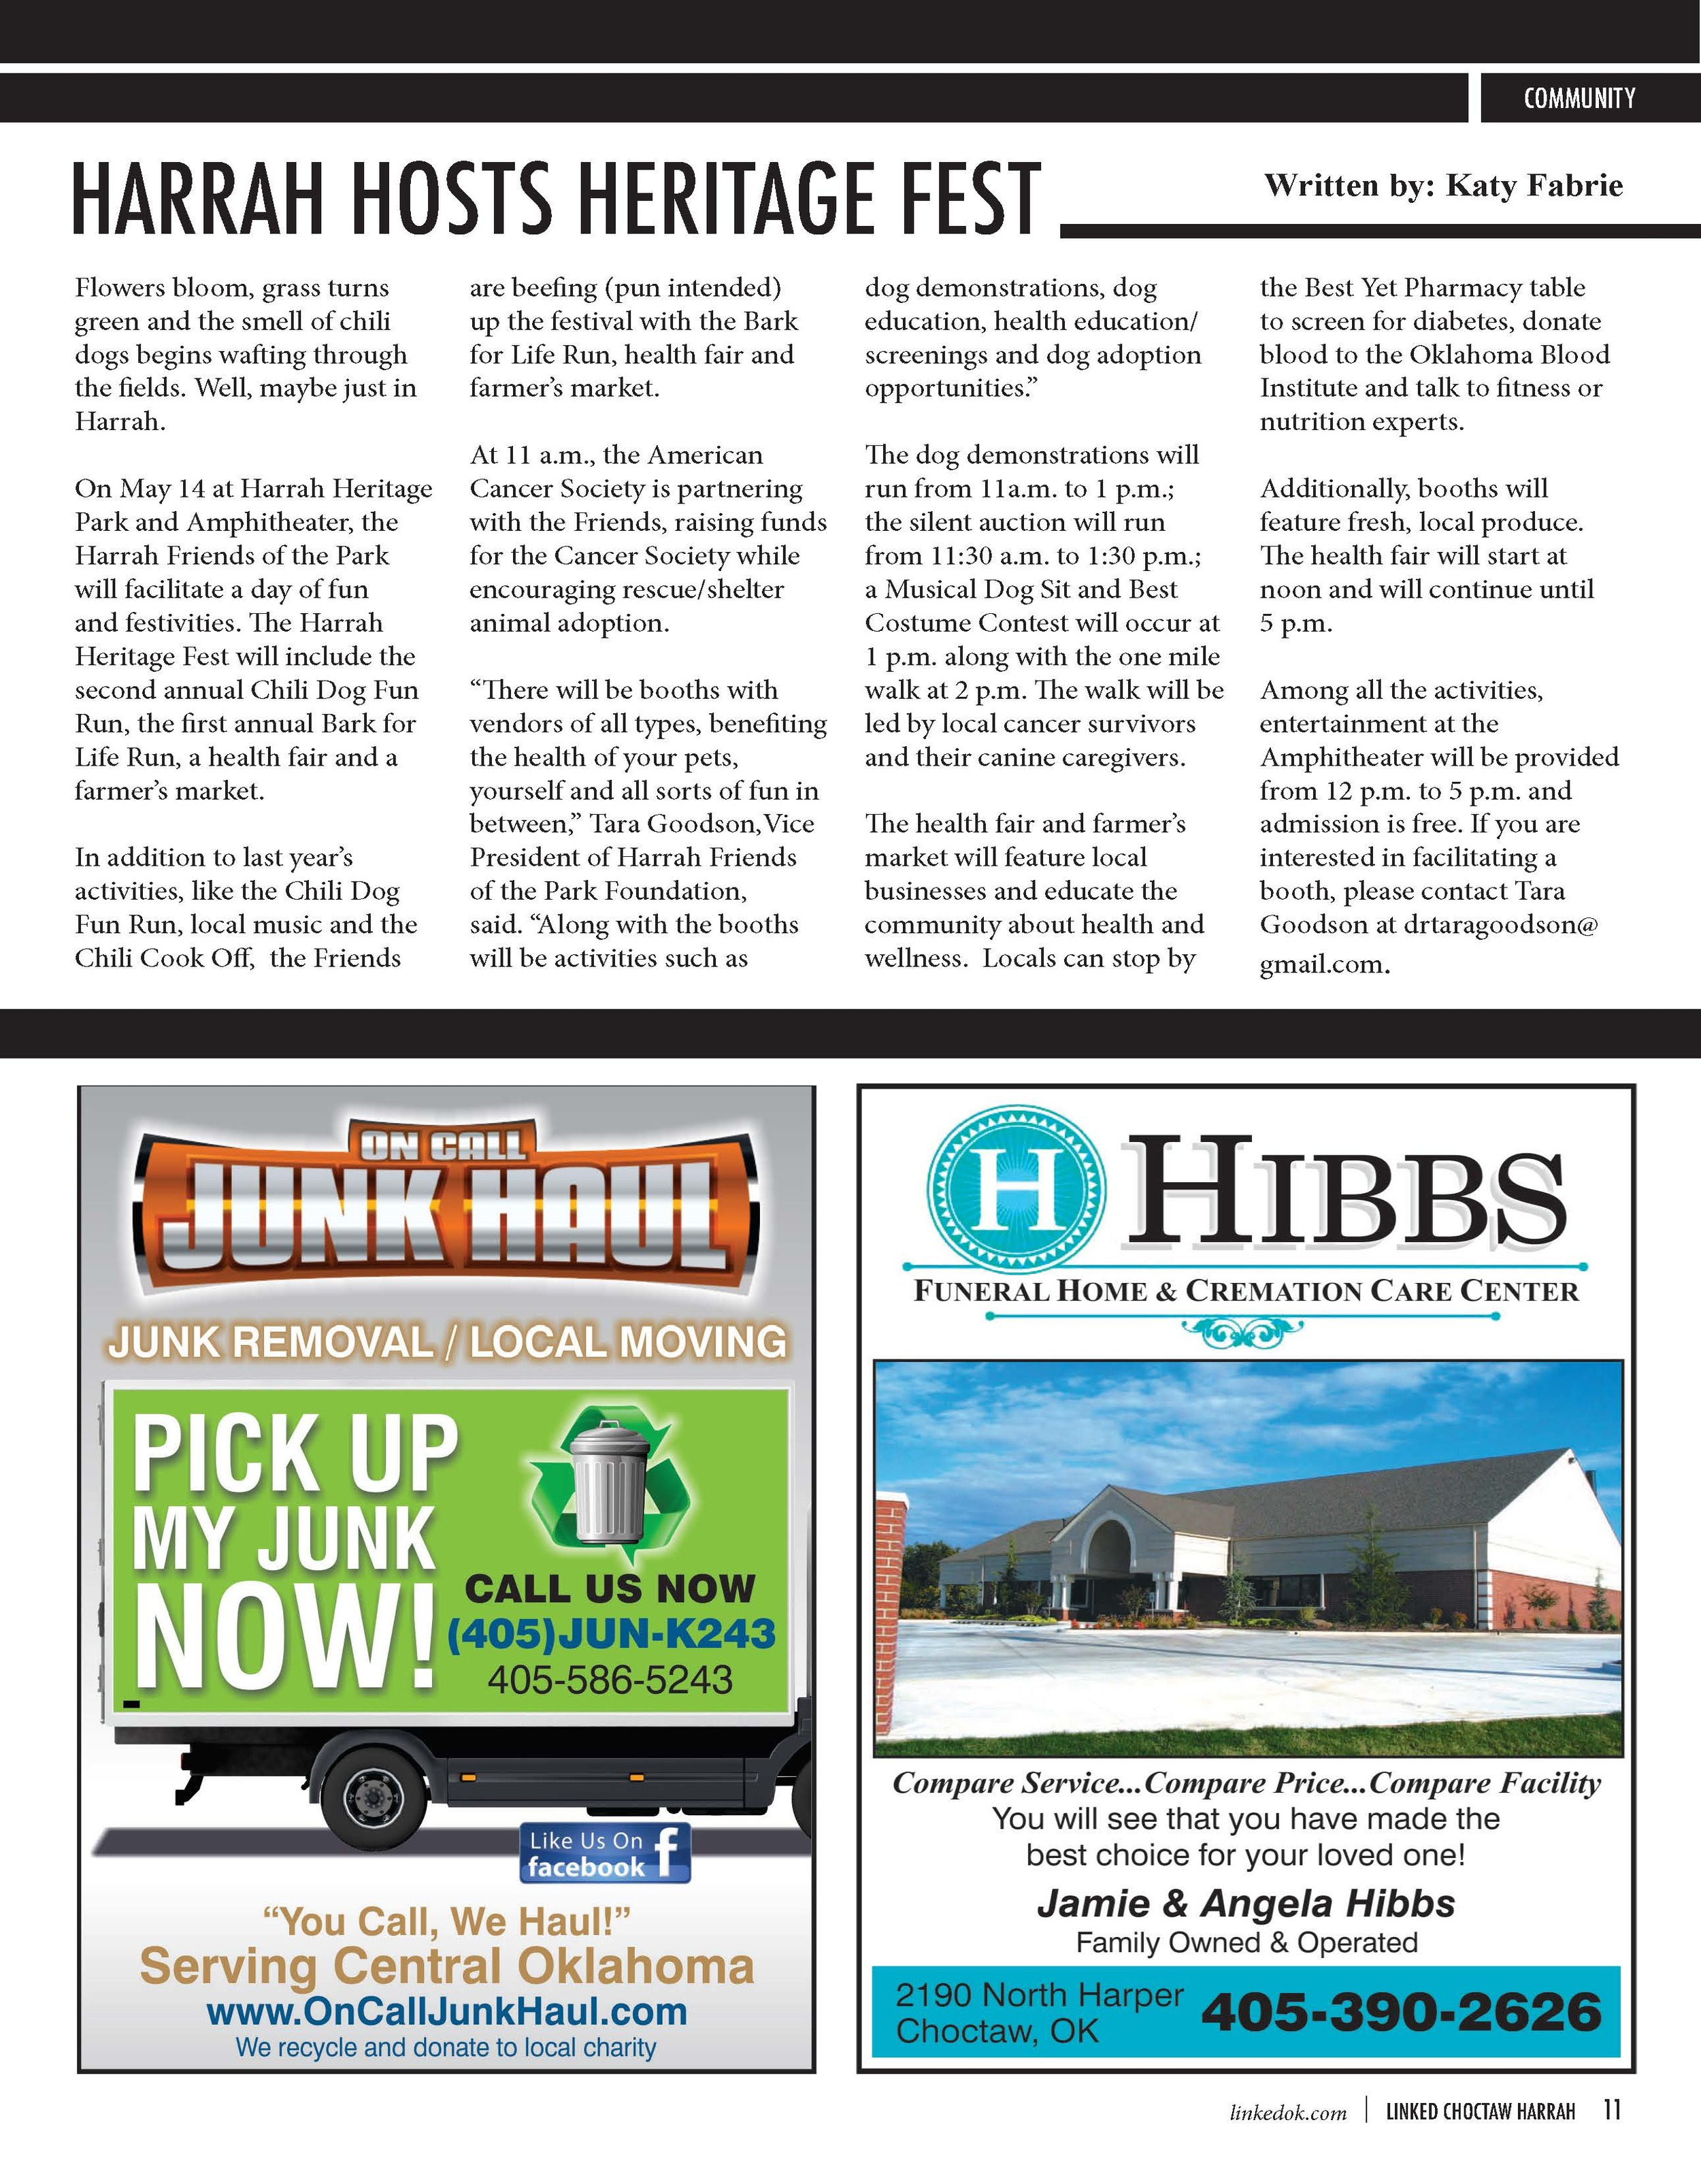 High Five_Choctaw Harrah_April 2016_Page_11.jpg